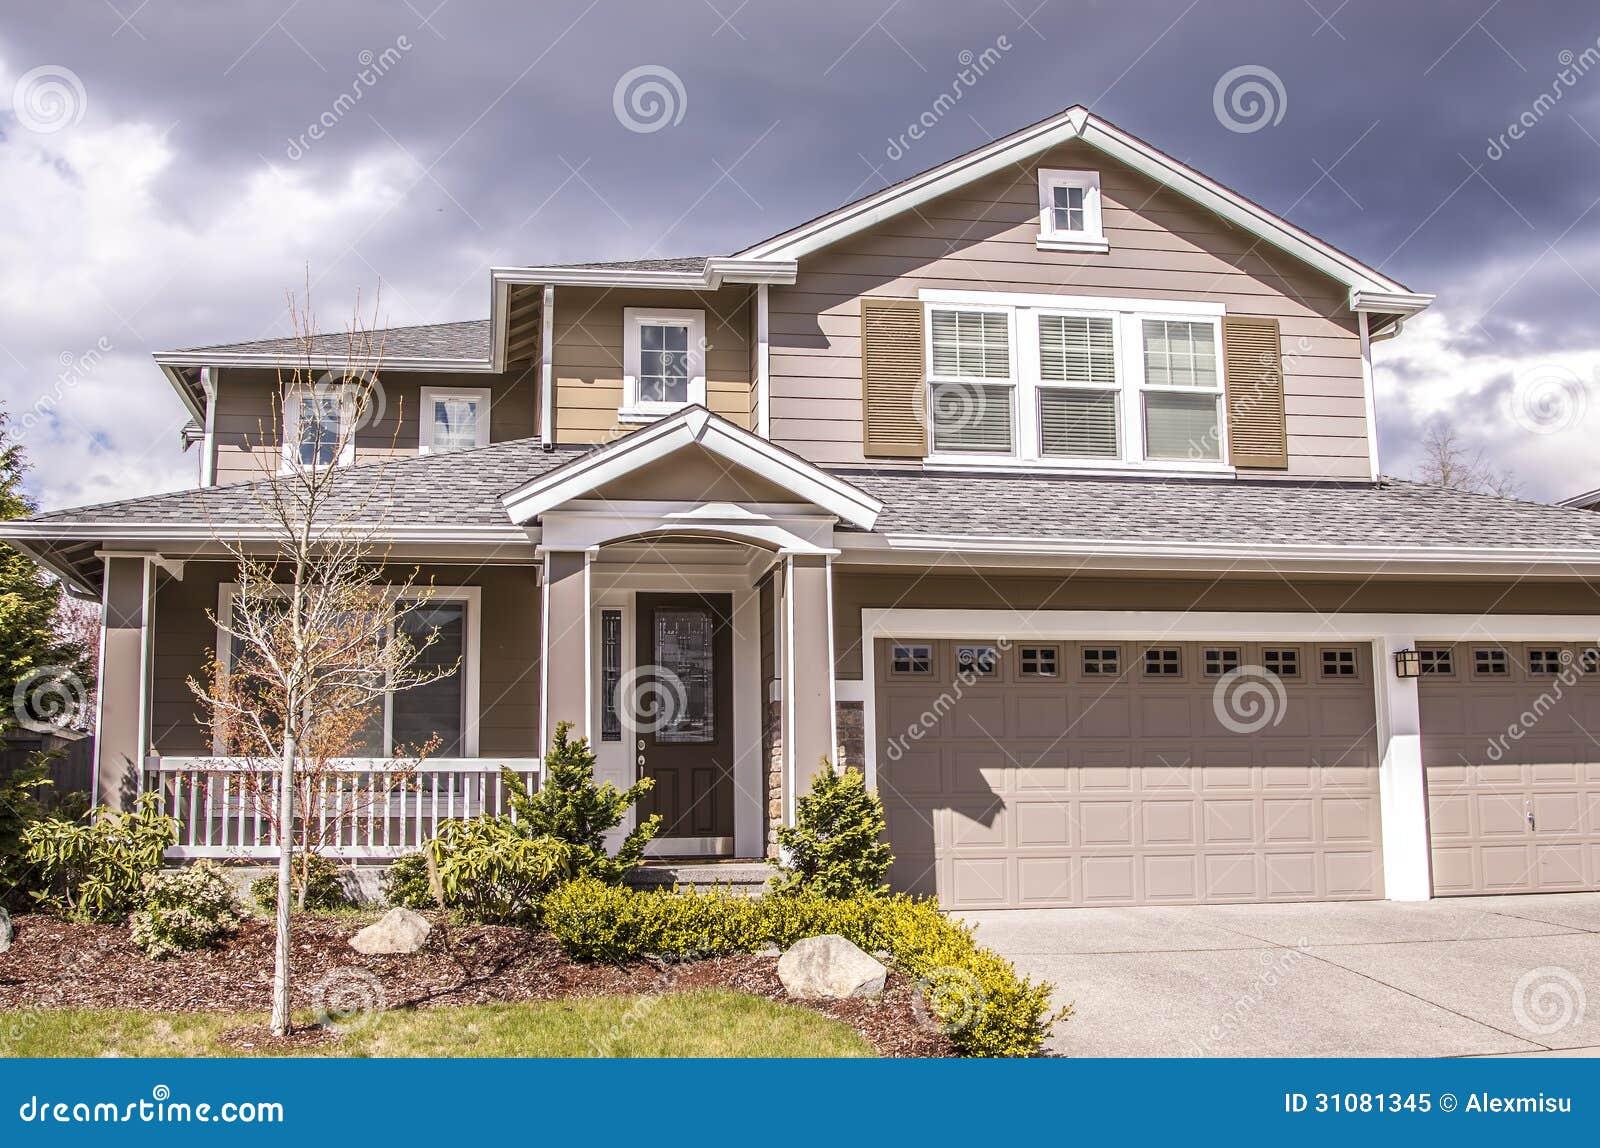 Suburban House Royalty Free Stock Photo Image 31081345